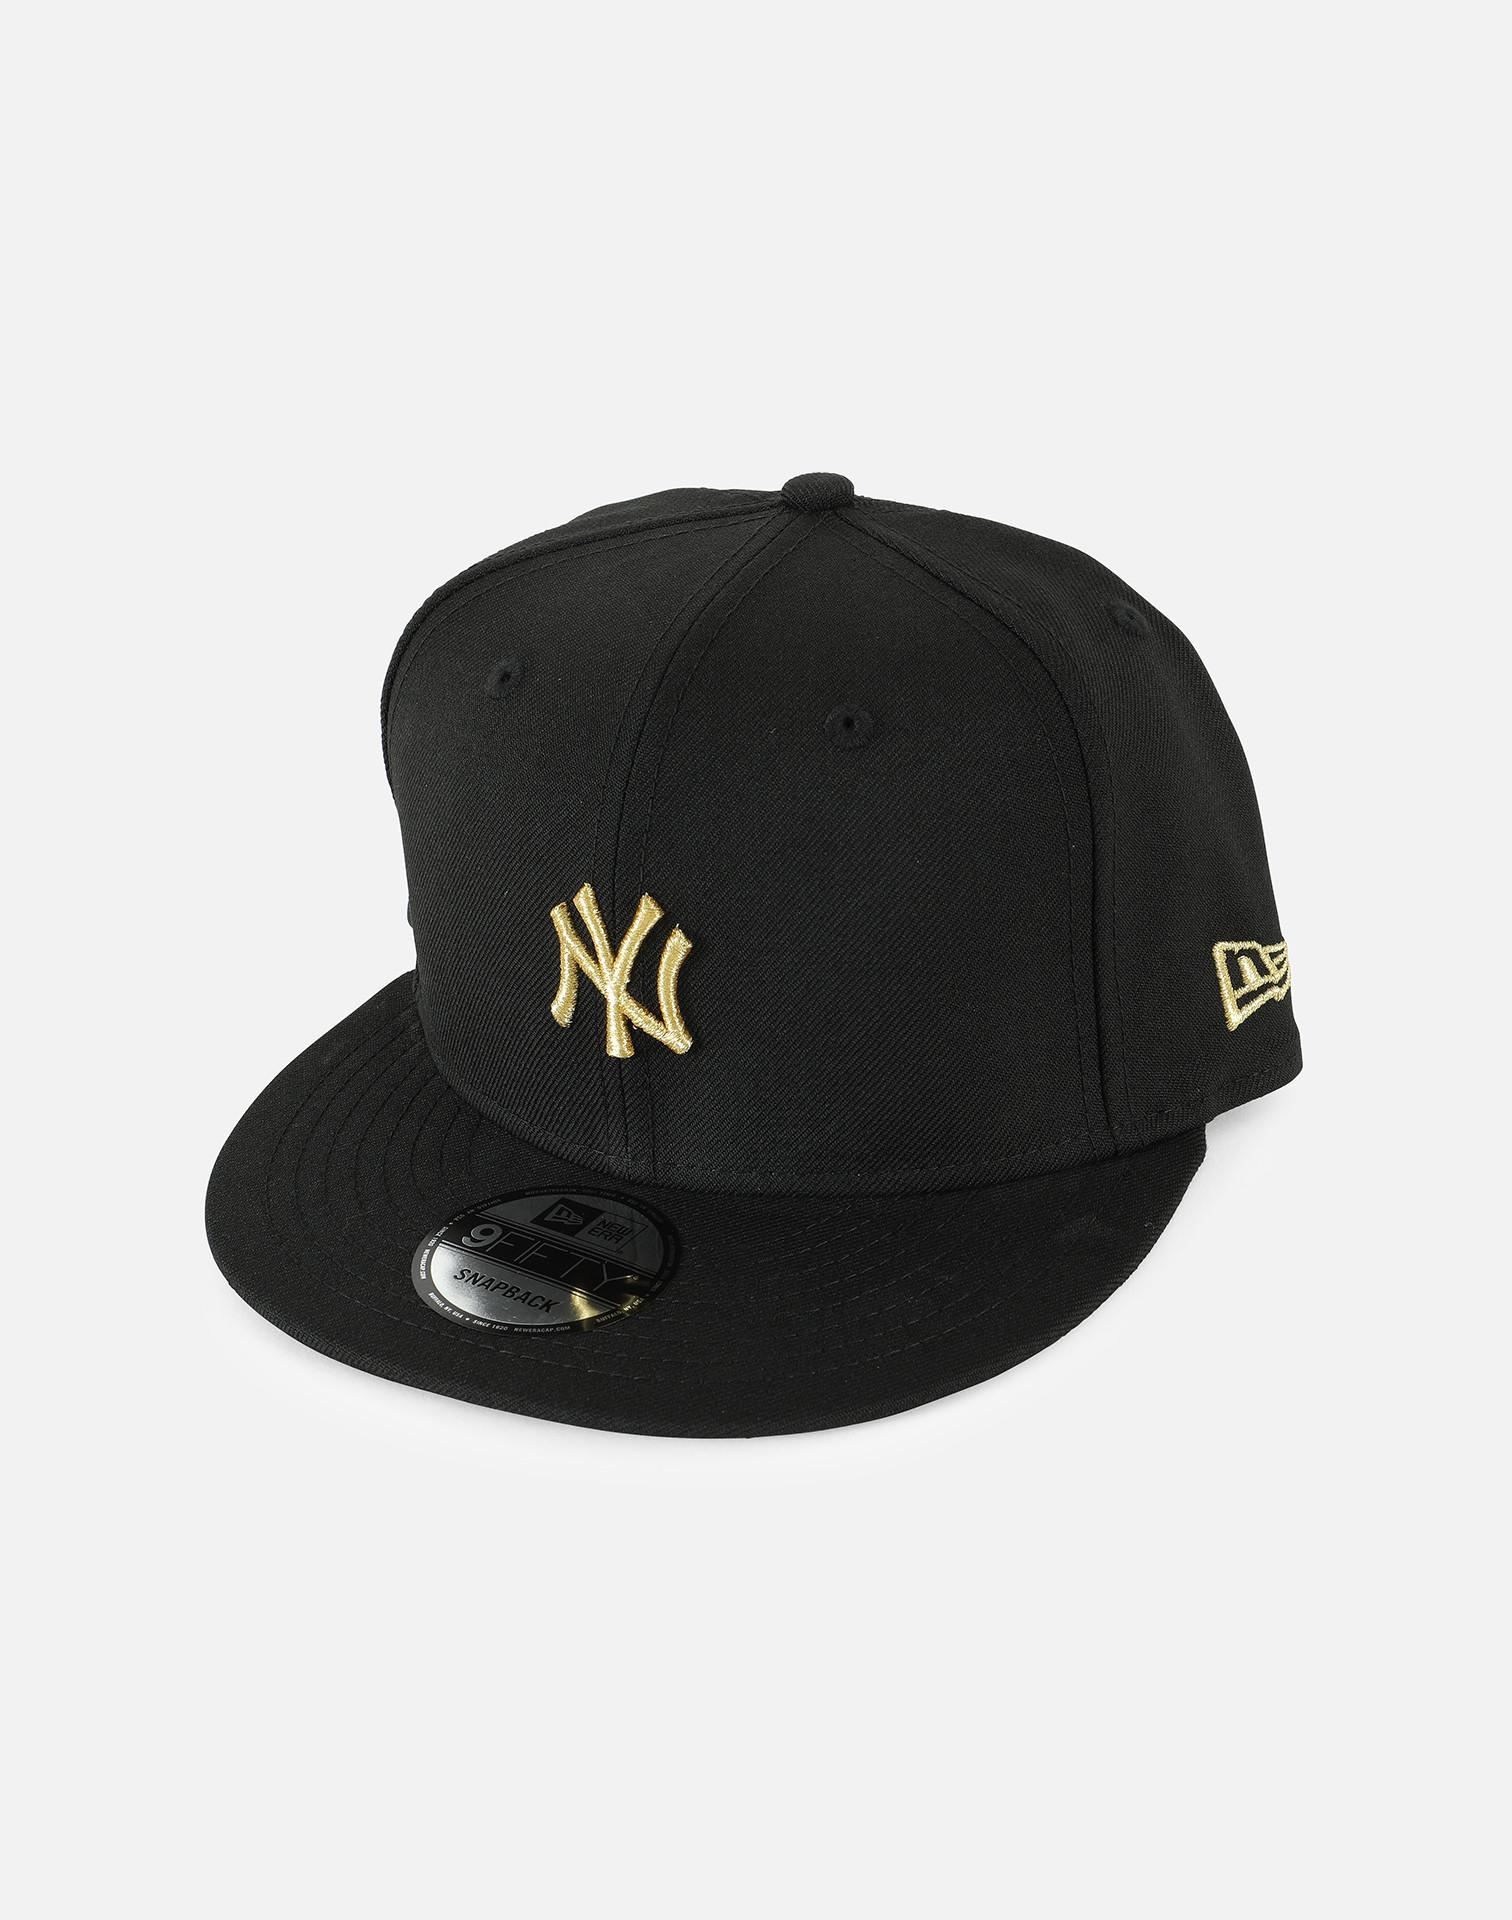 MLB NEW YORK YANKEES GOLD BADGE SNAPBACK HAT - NY Sports Shop 00a8a5a3a85e